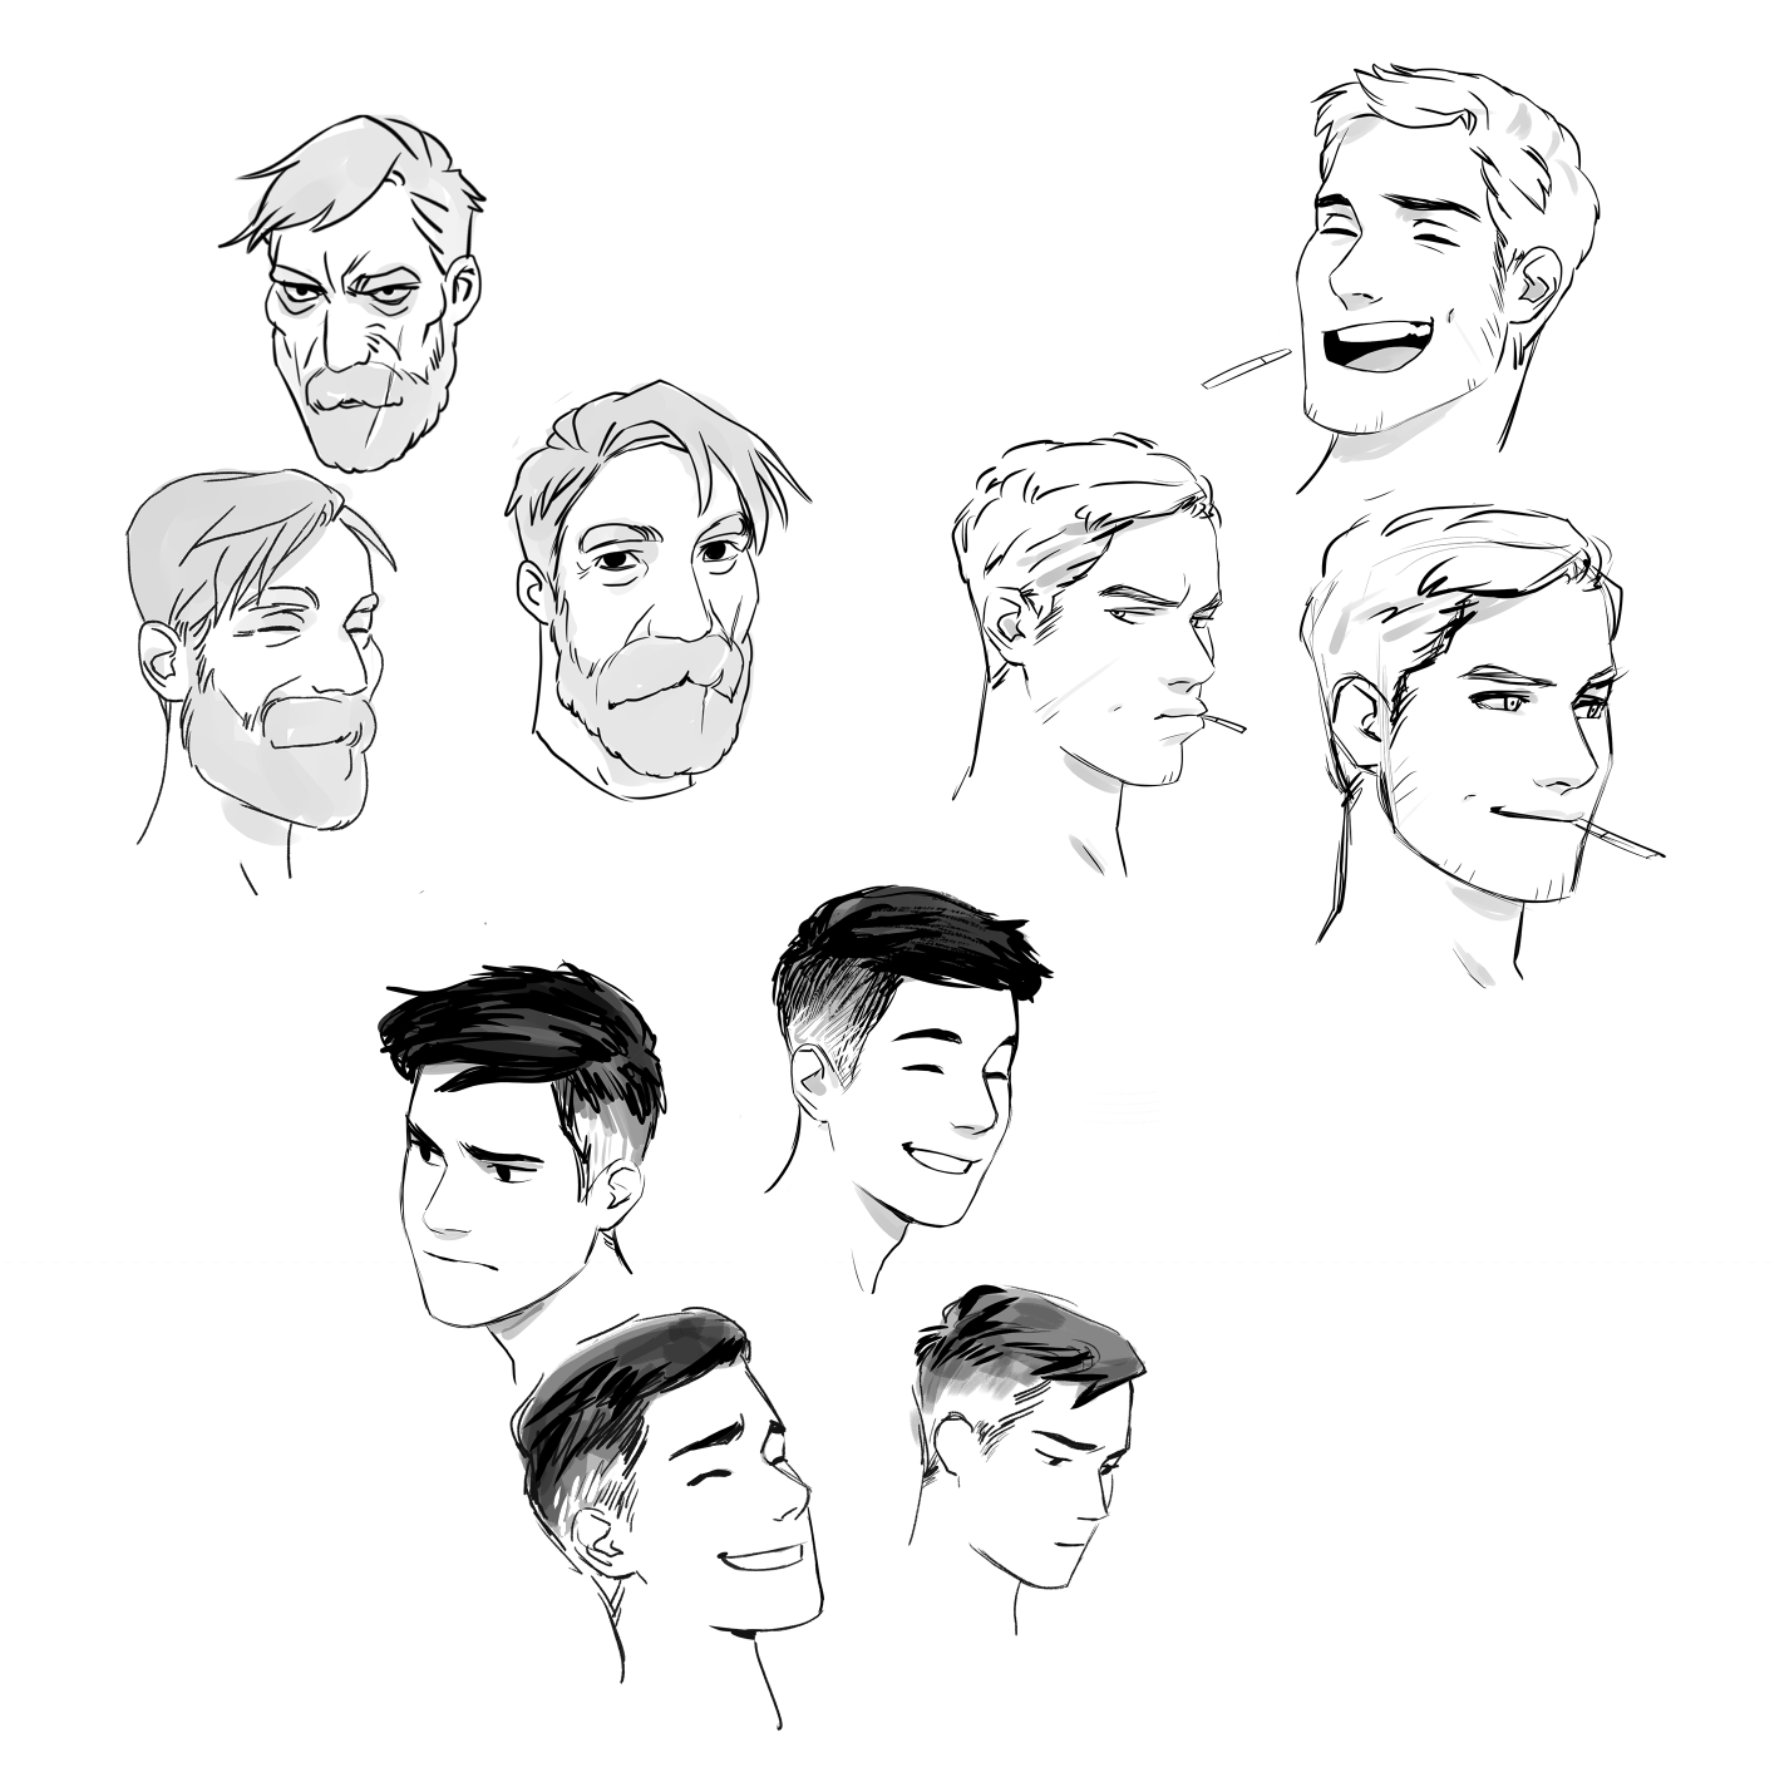 Pin By Gordonisnext On Art Guy Drawing Face Drawing Human Face Drawing